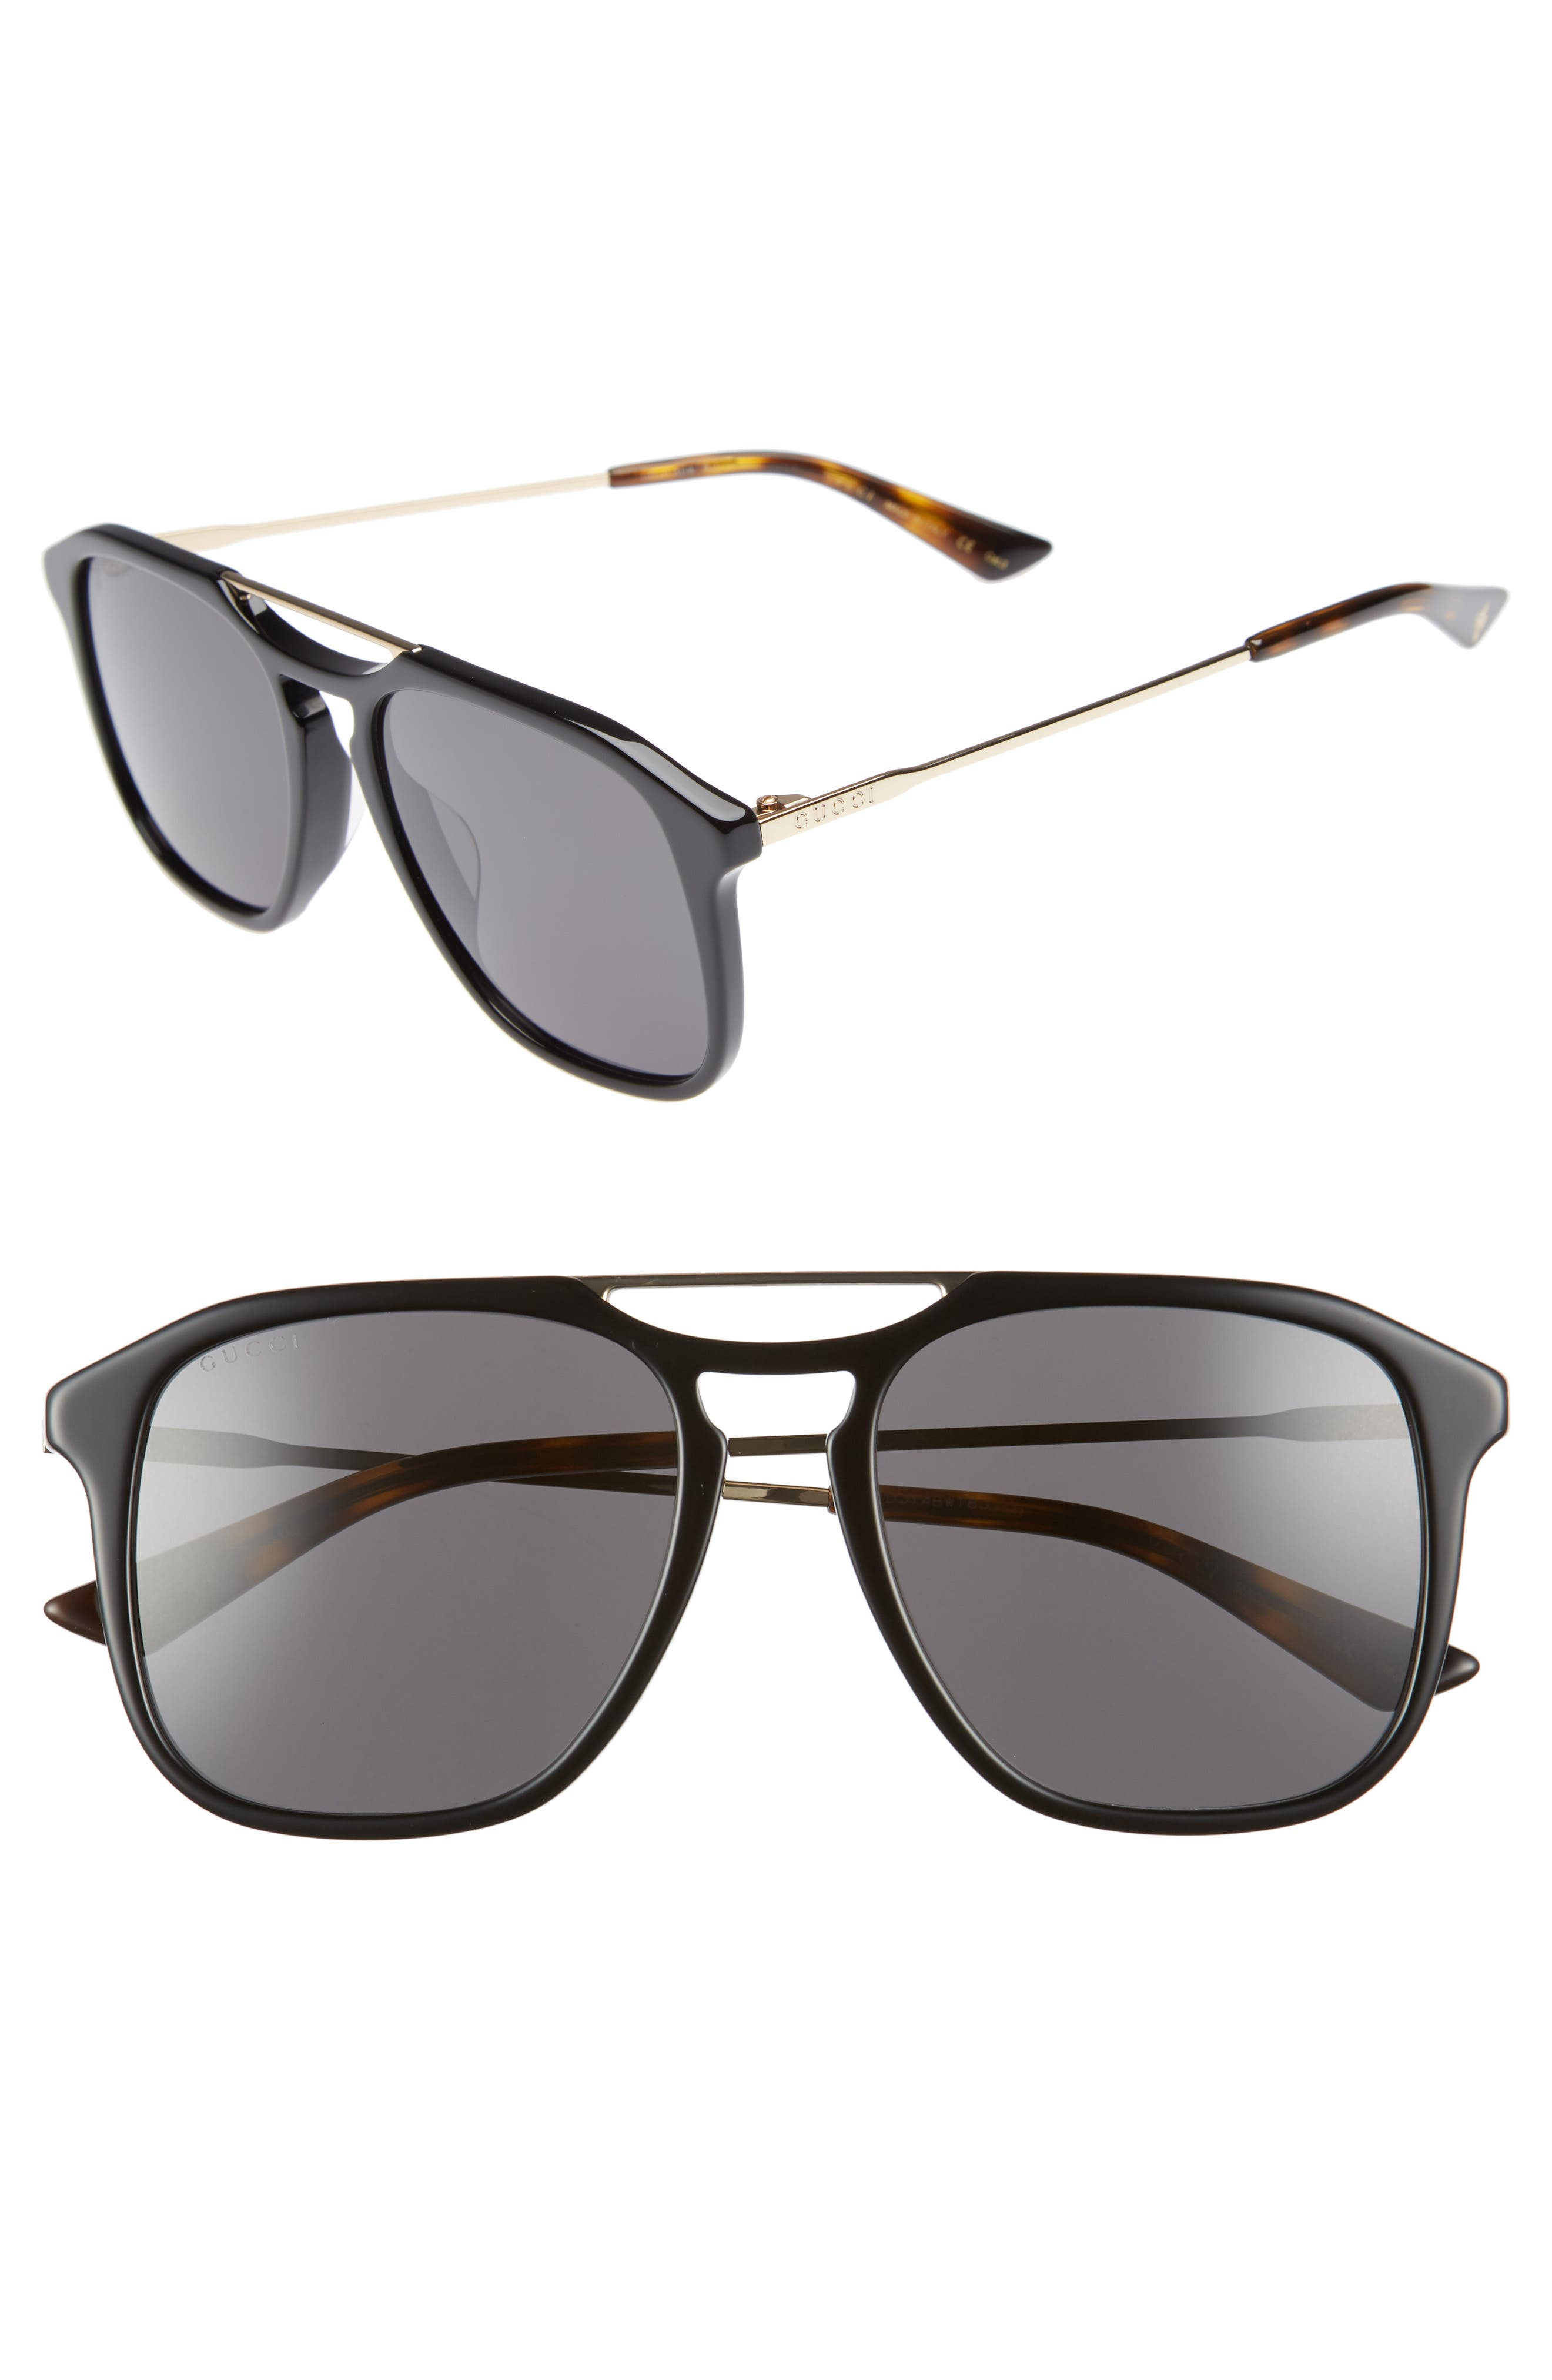 6932ecfed Gucci Light Combi 55Mm Aviator Sunglasses - Gold/ Dark Havana